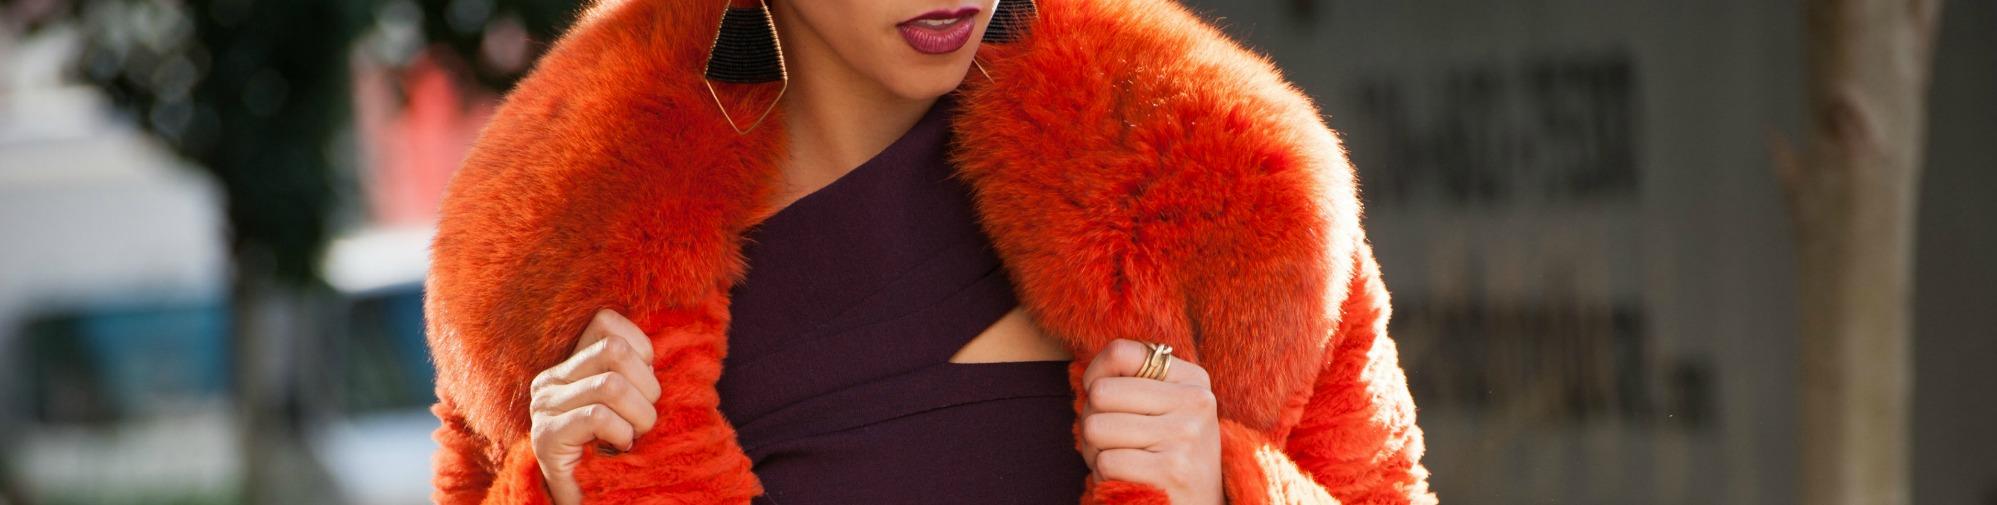 woman in purple dress and orange coat